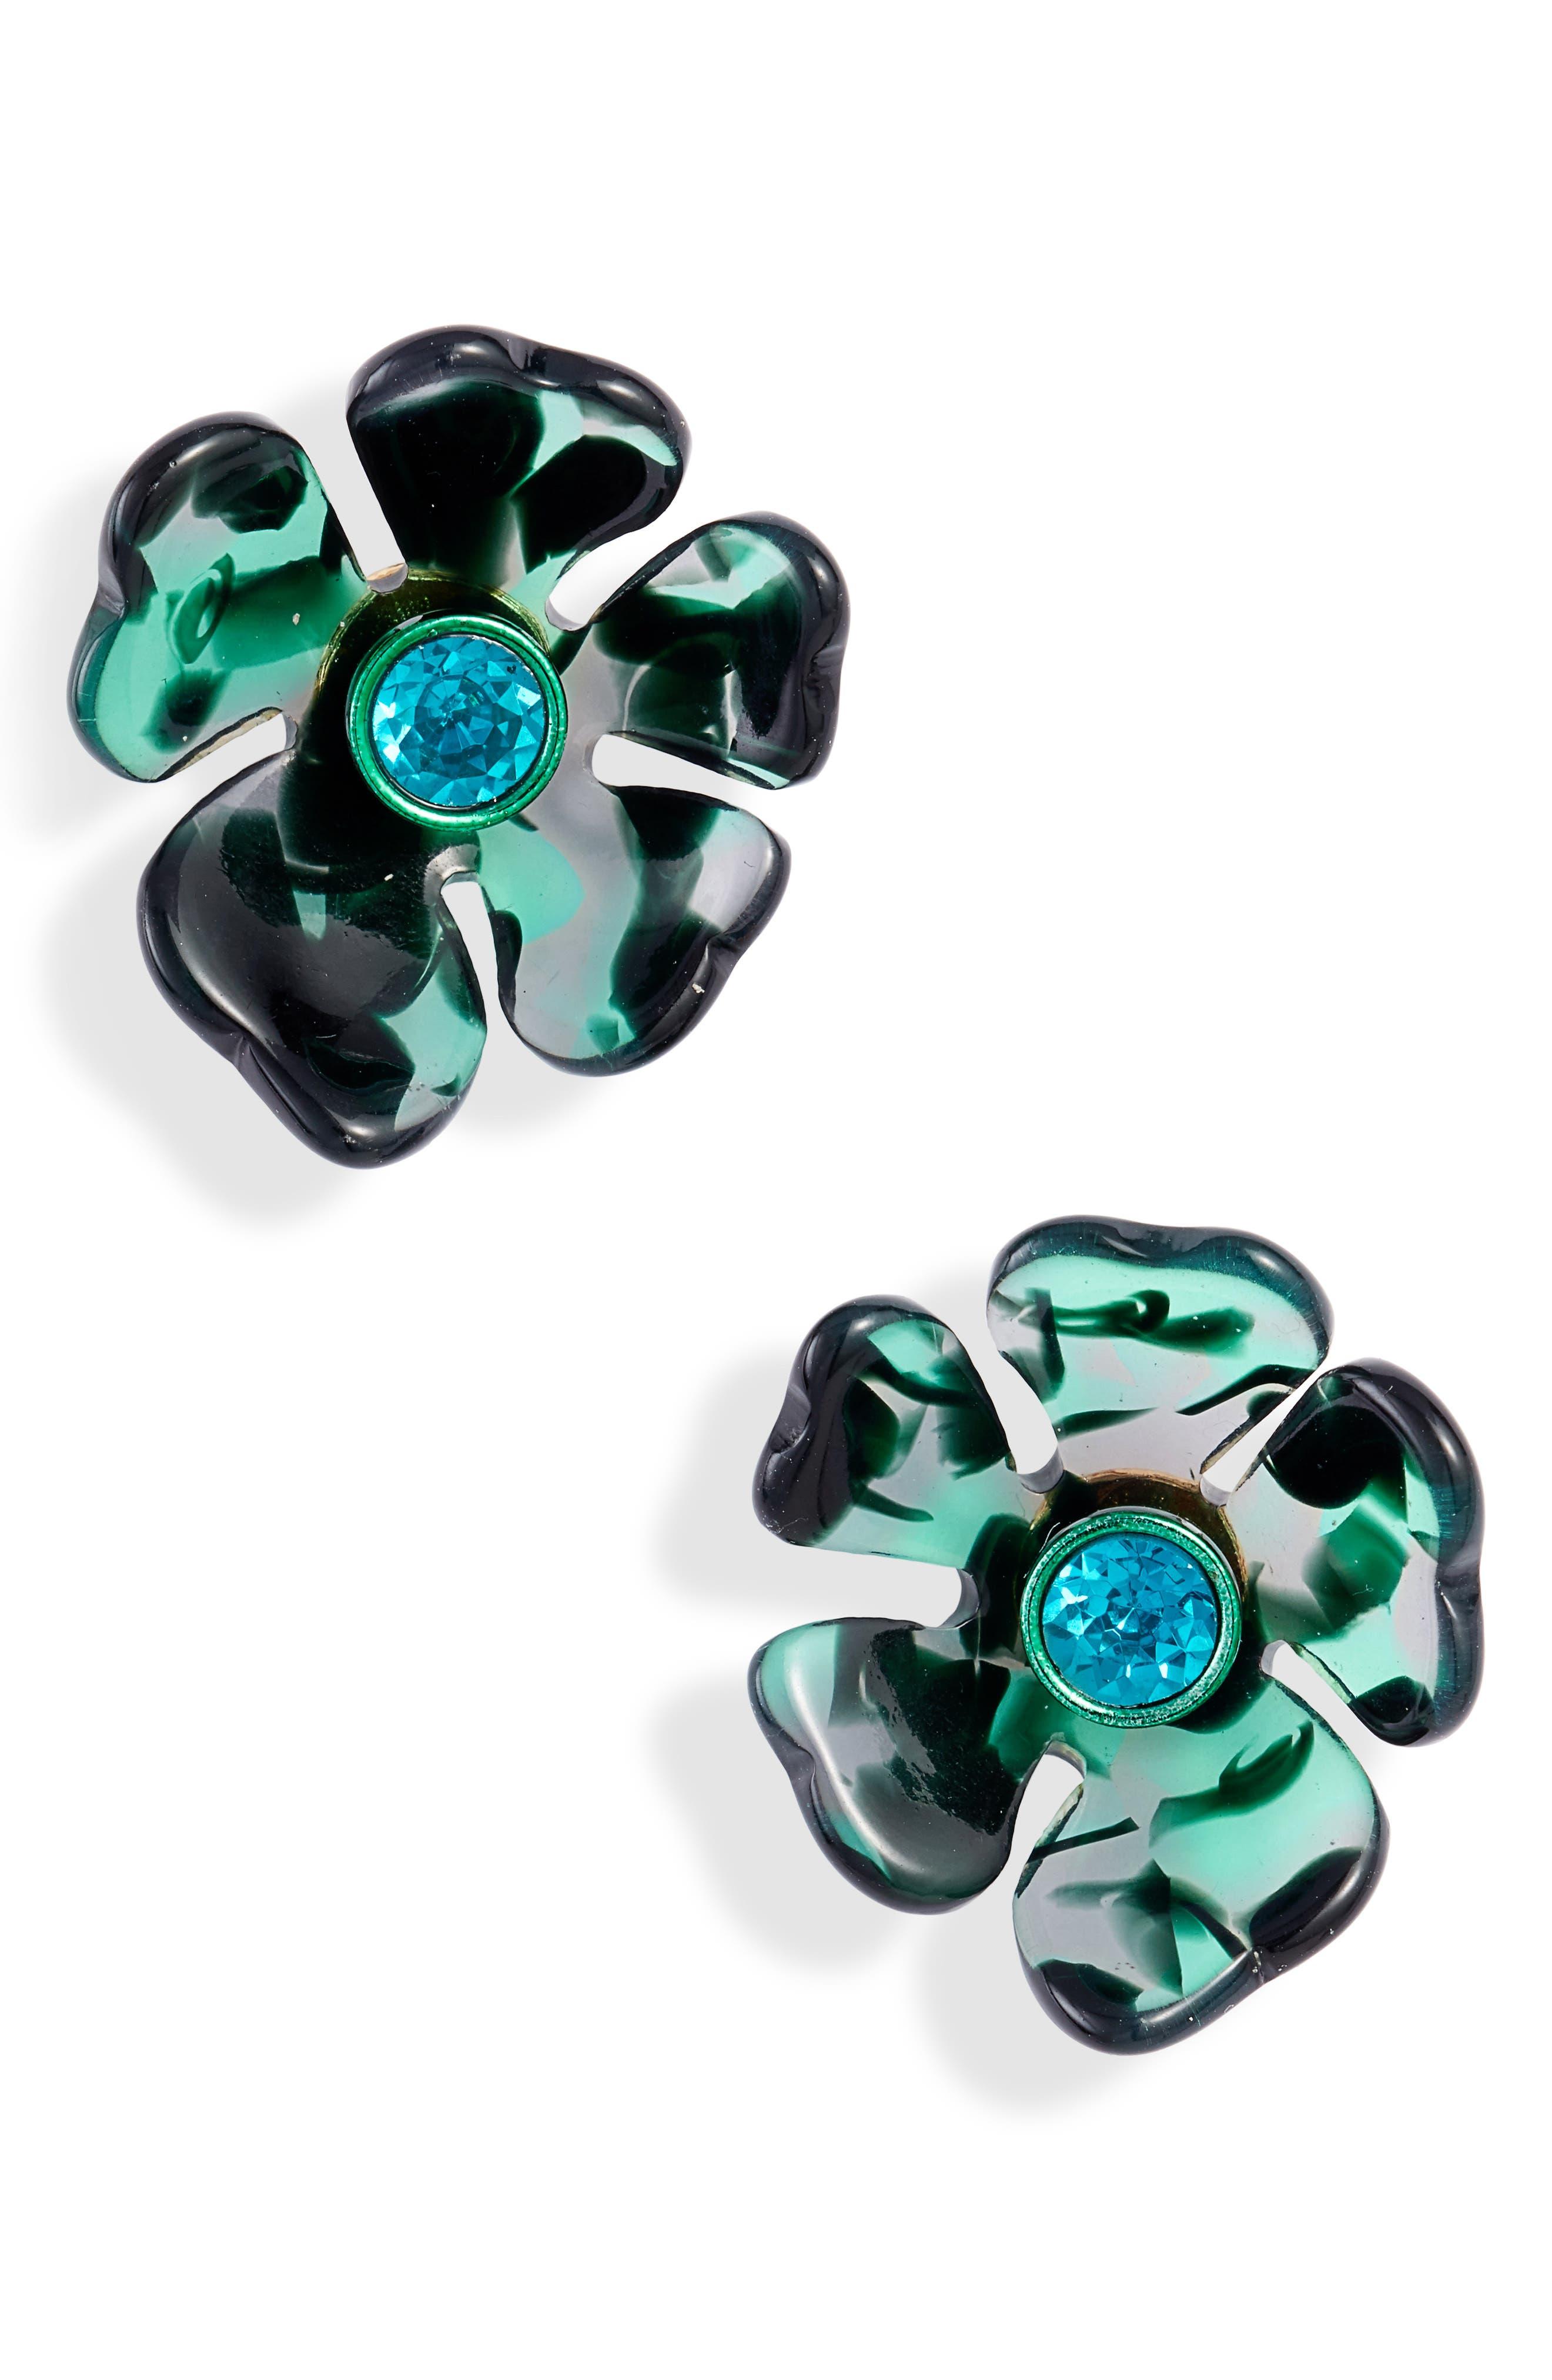 Kate Spade New York Jewelry petal pushers stud earrings